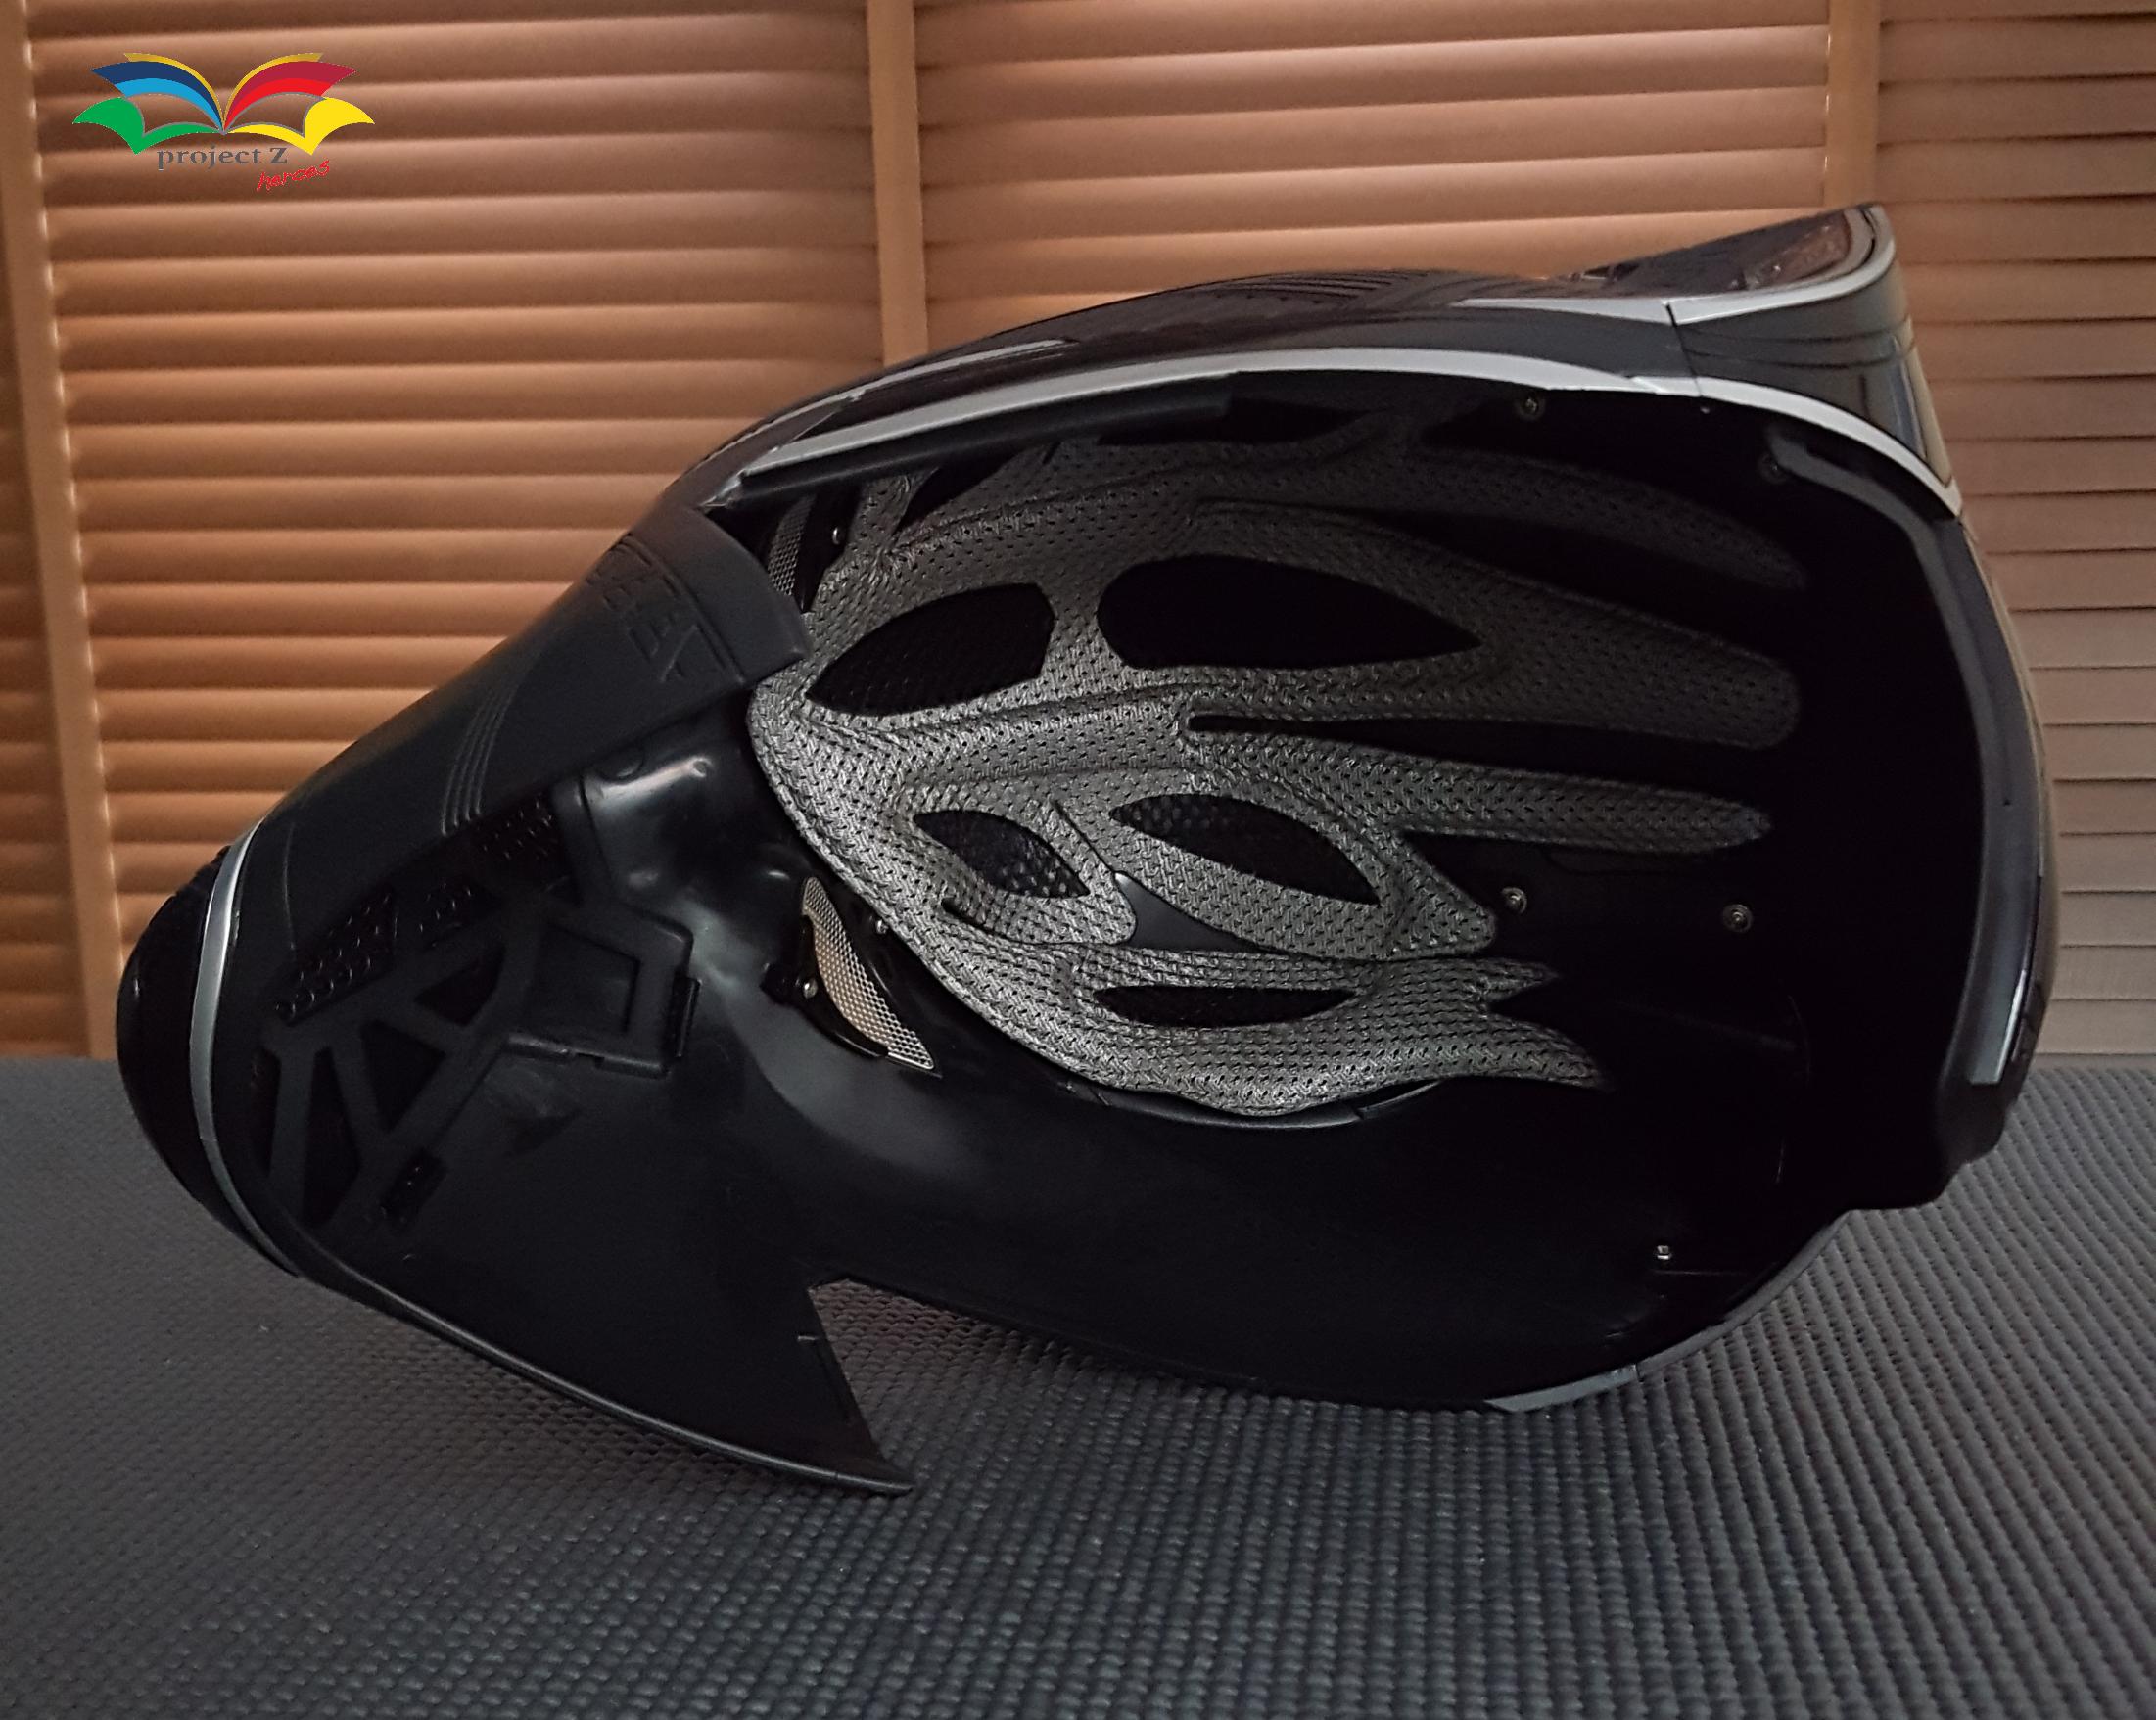 Black Panther costume helmet 4